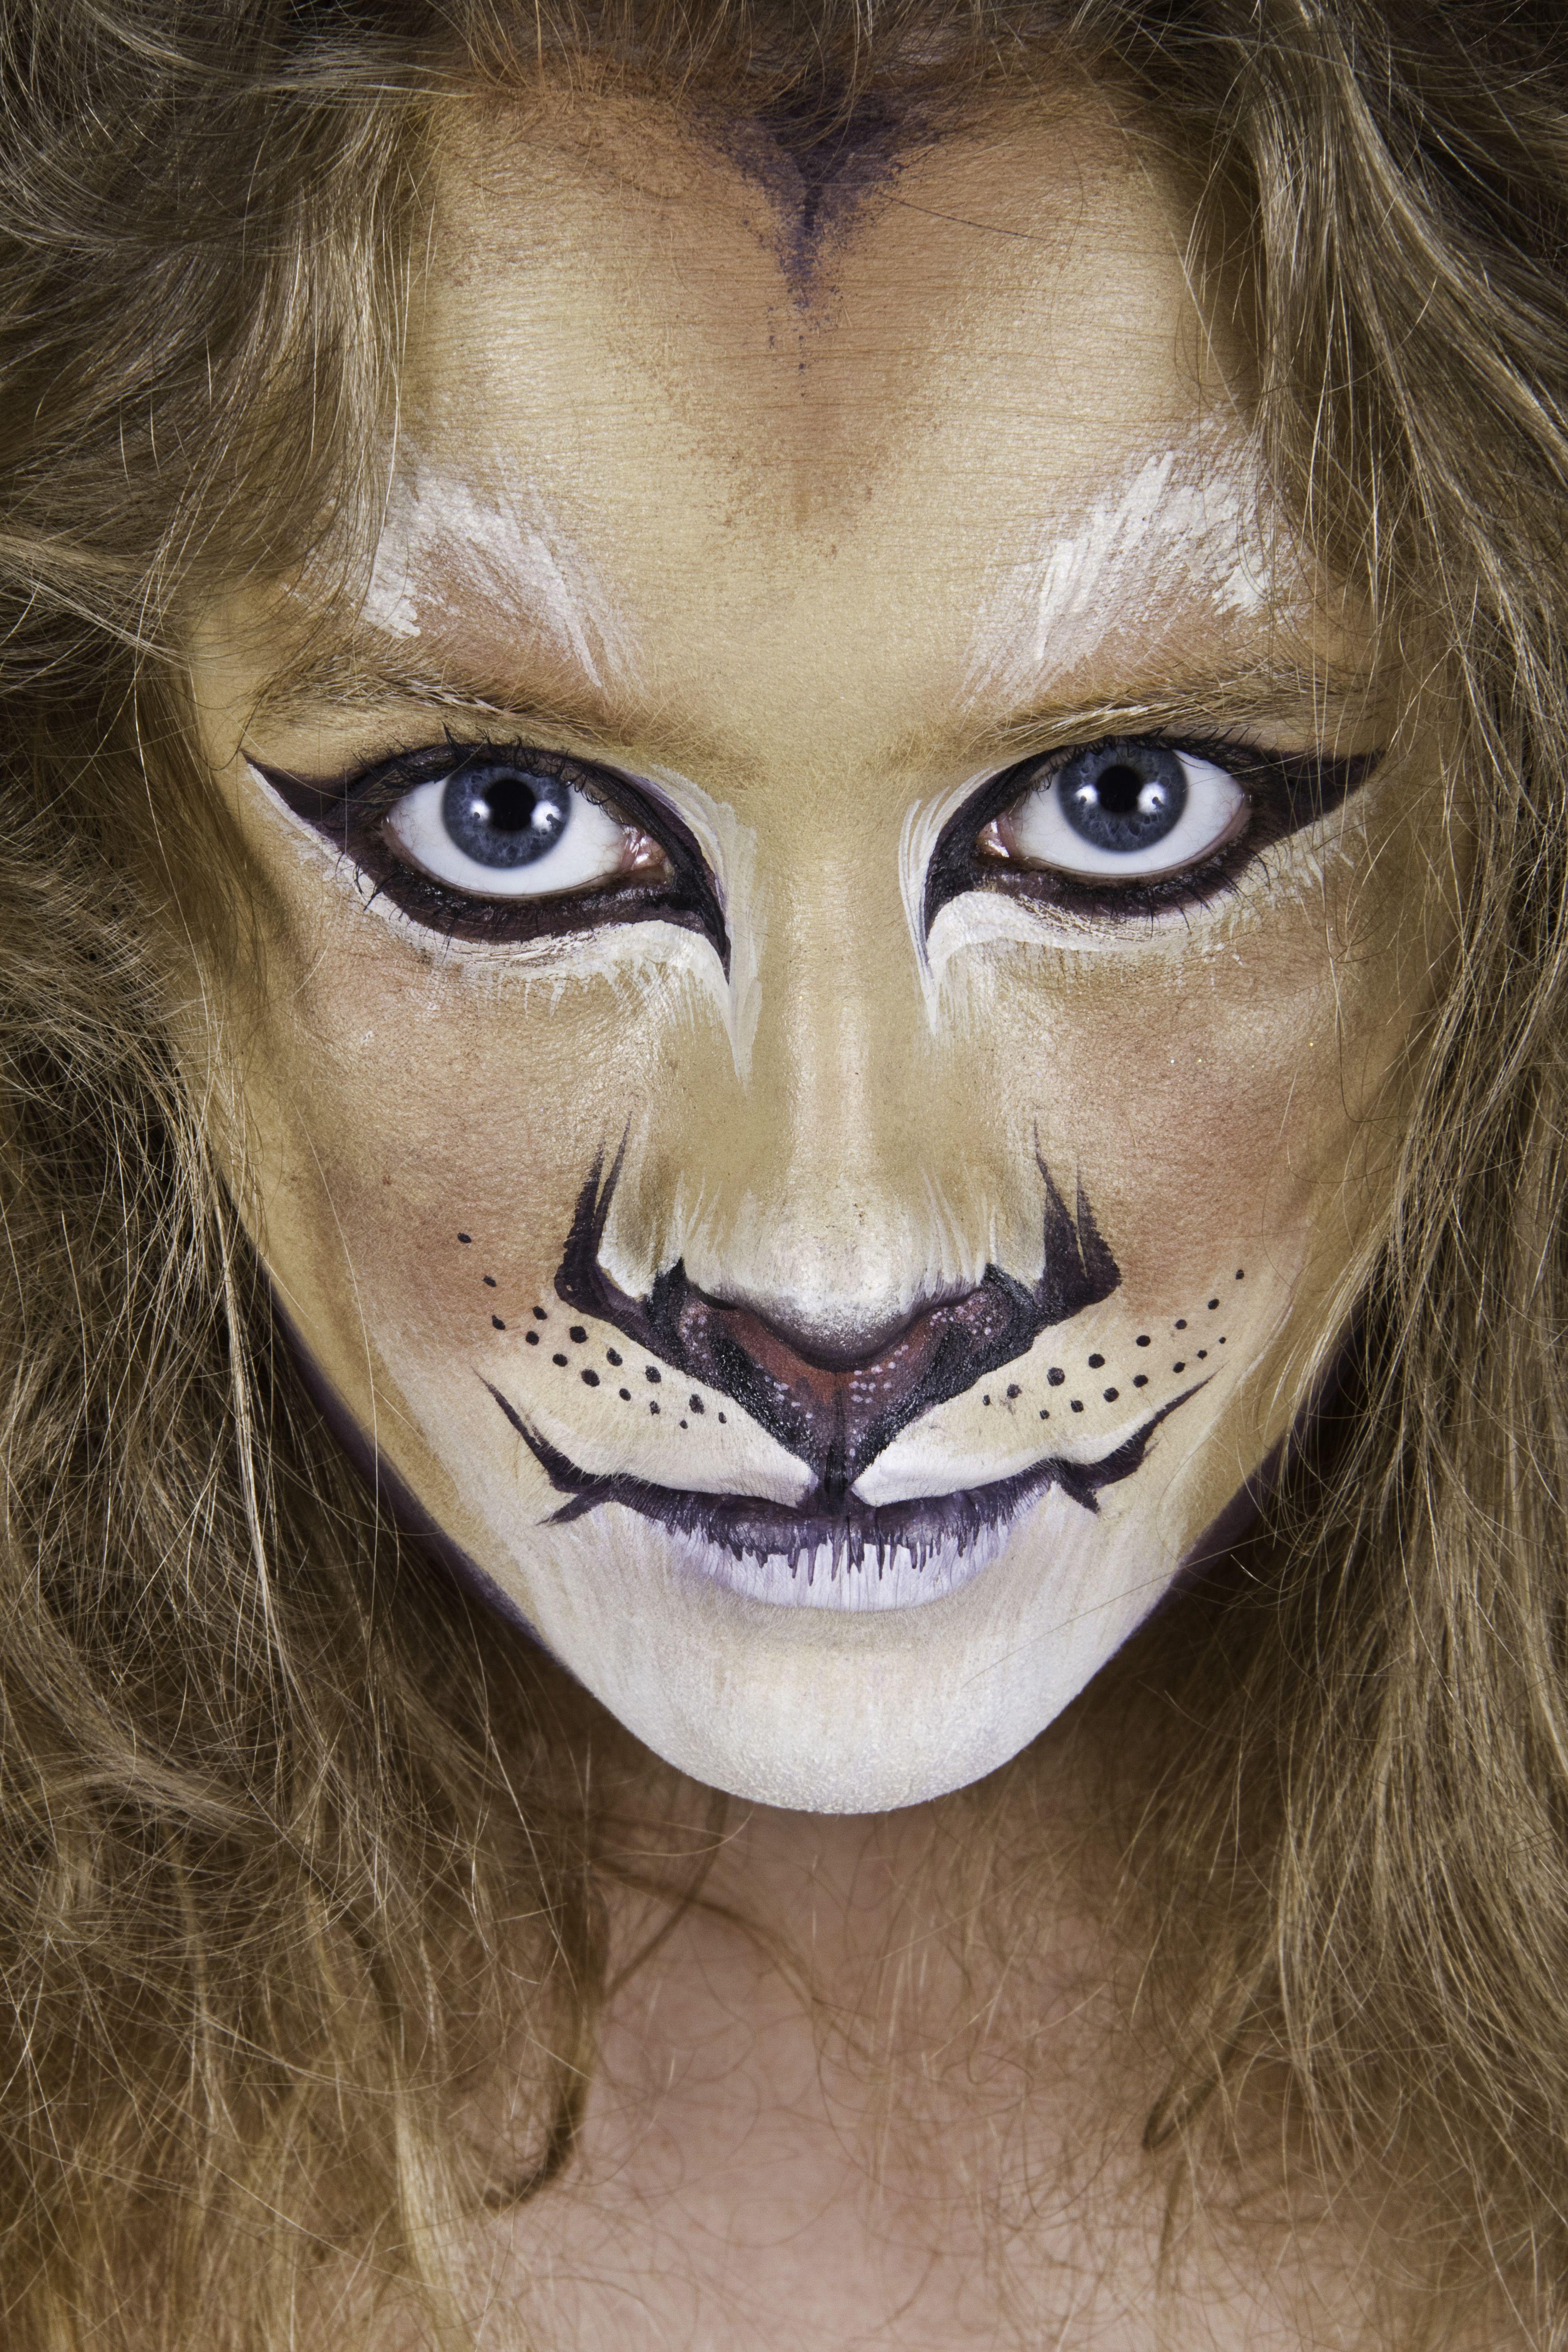 Cheetah makeup for Halloween cheetahmakeup halloween